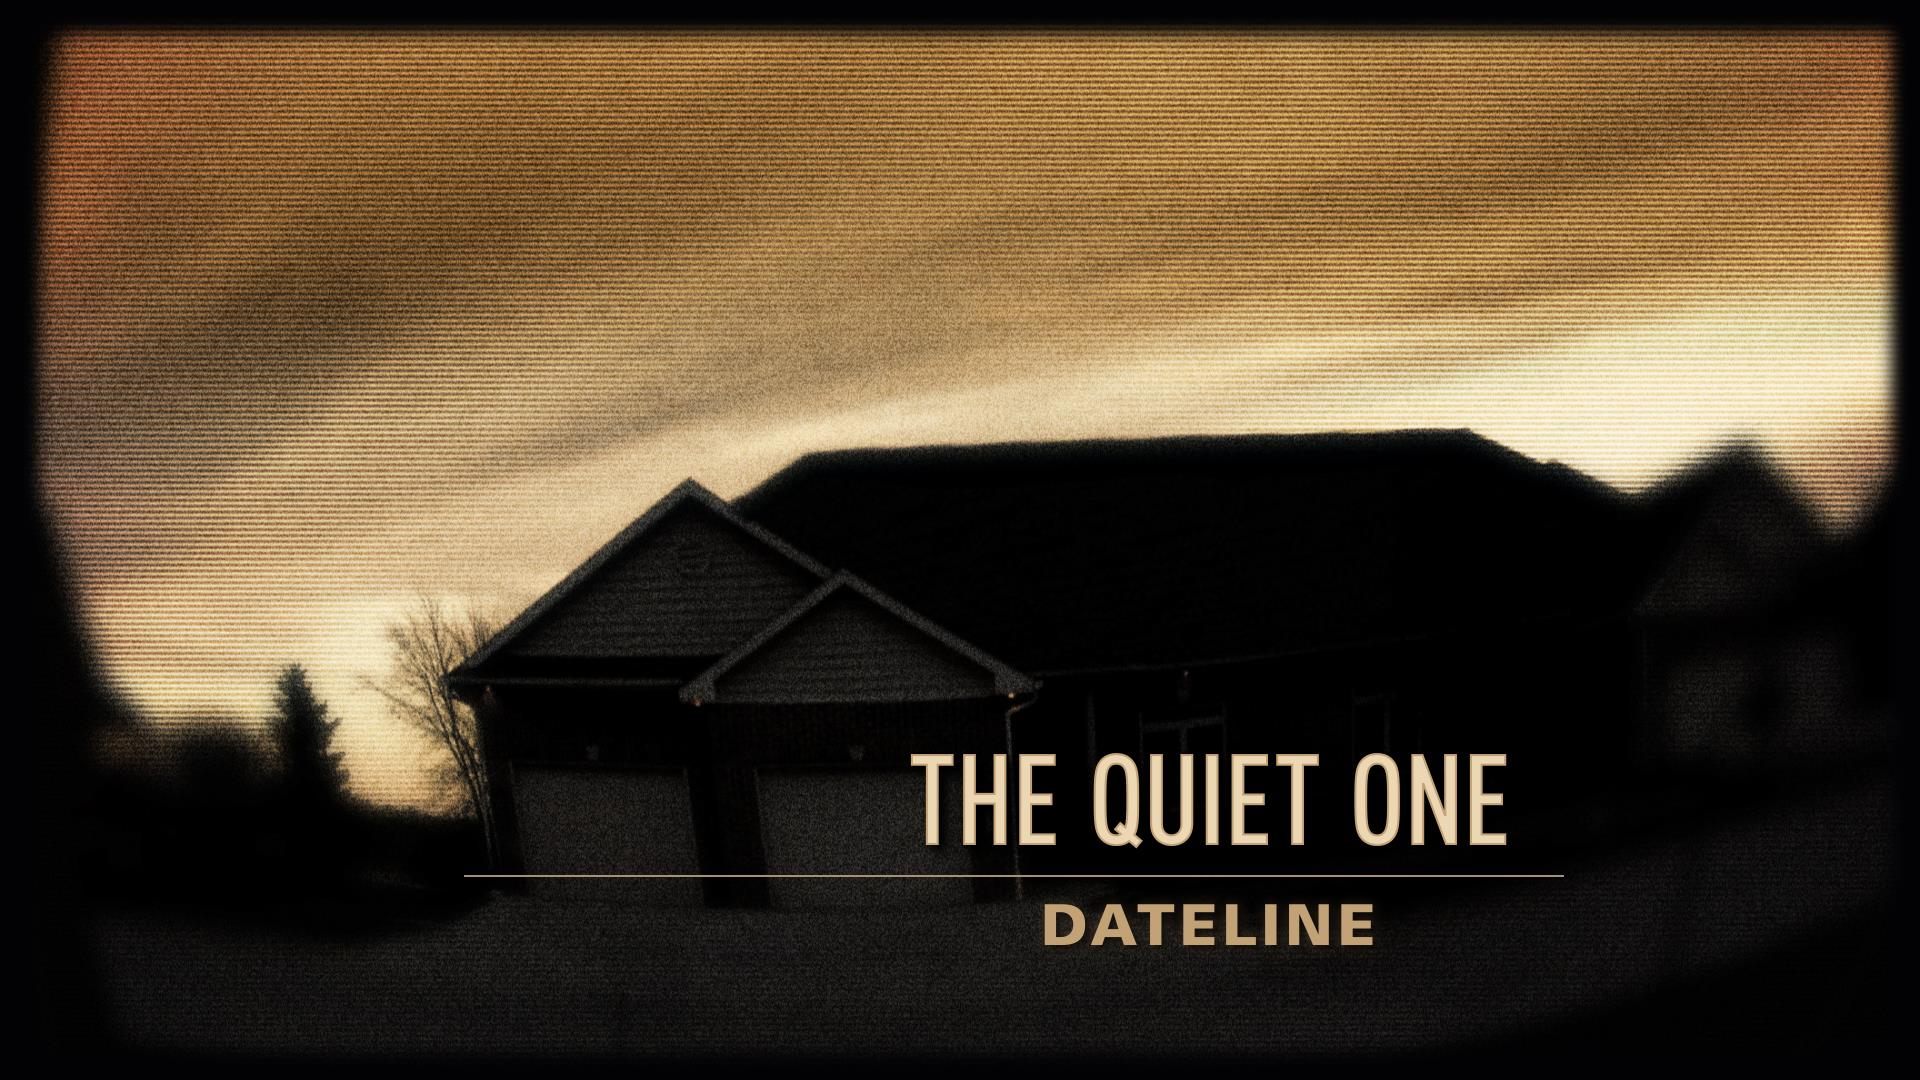 Dateline Trailer: The Quiet One